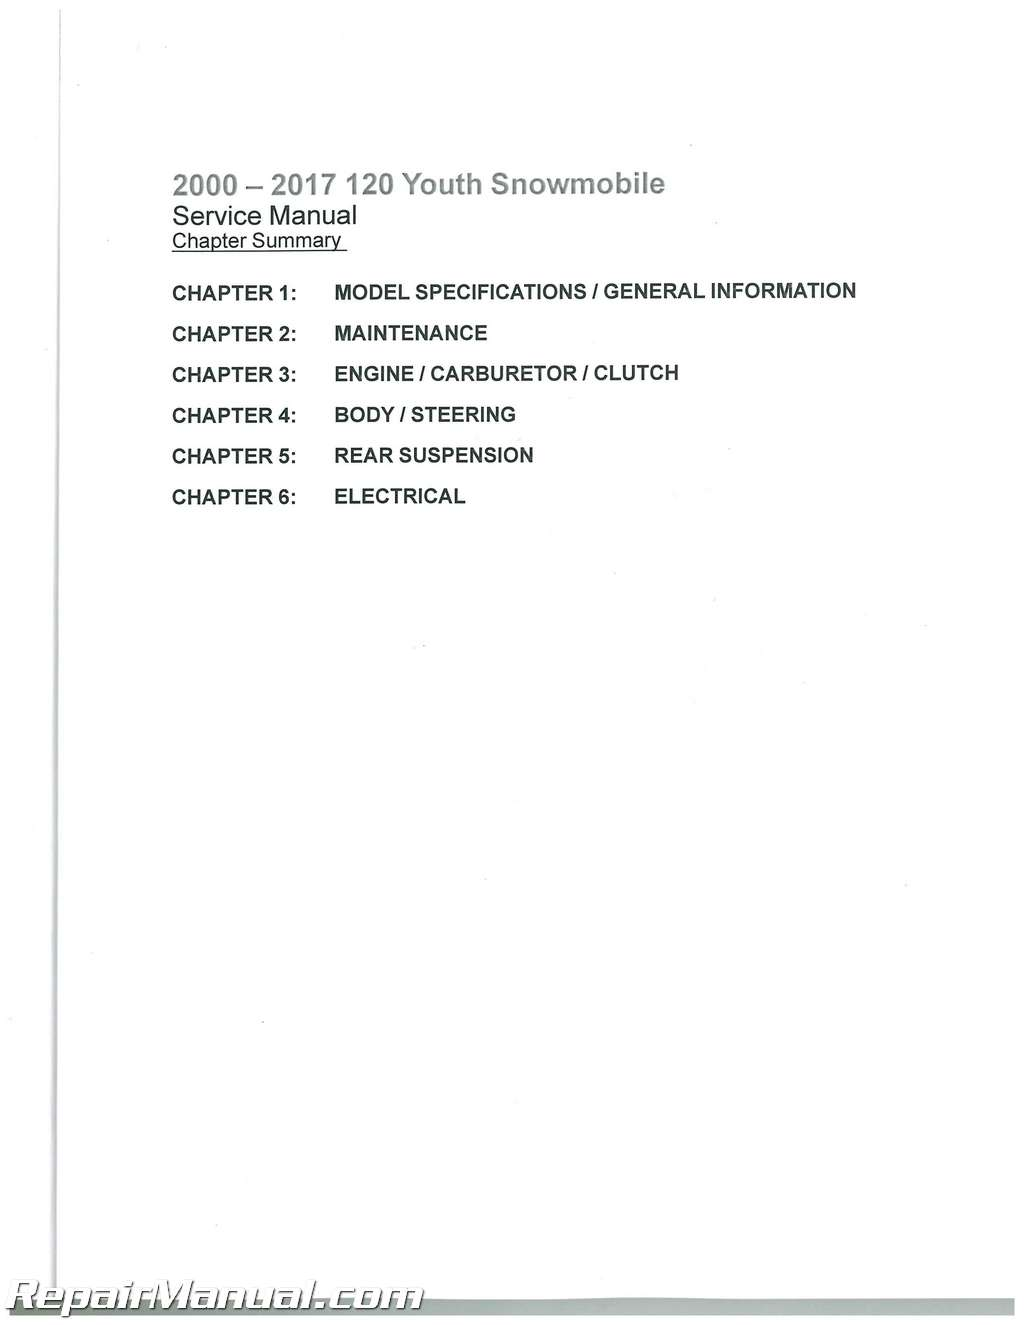 2000 – 2017 Polaris Youth 120 Snowmobile Service Manual